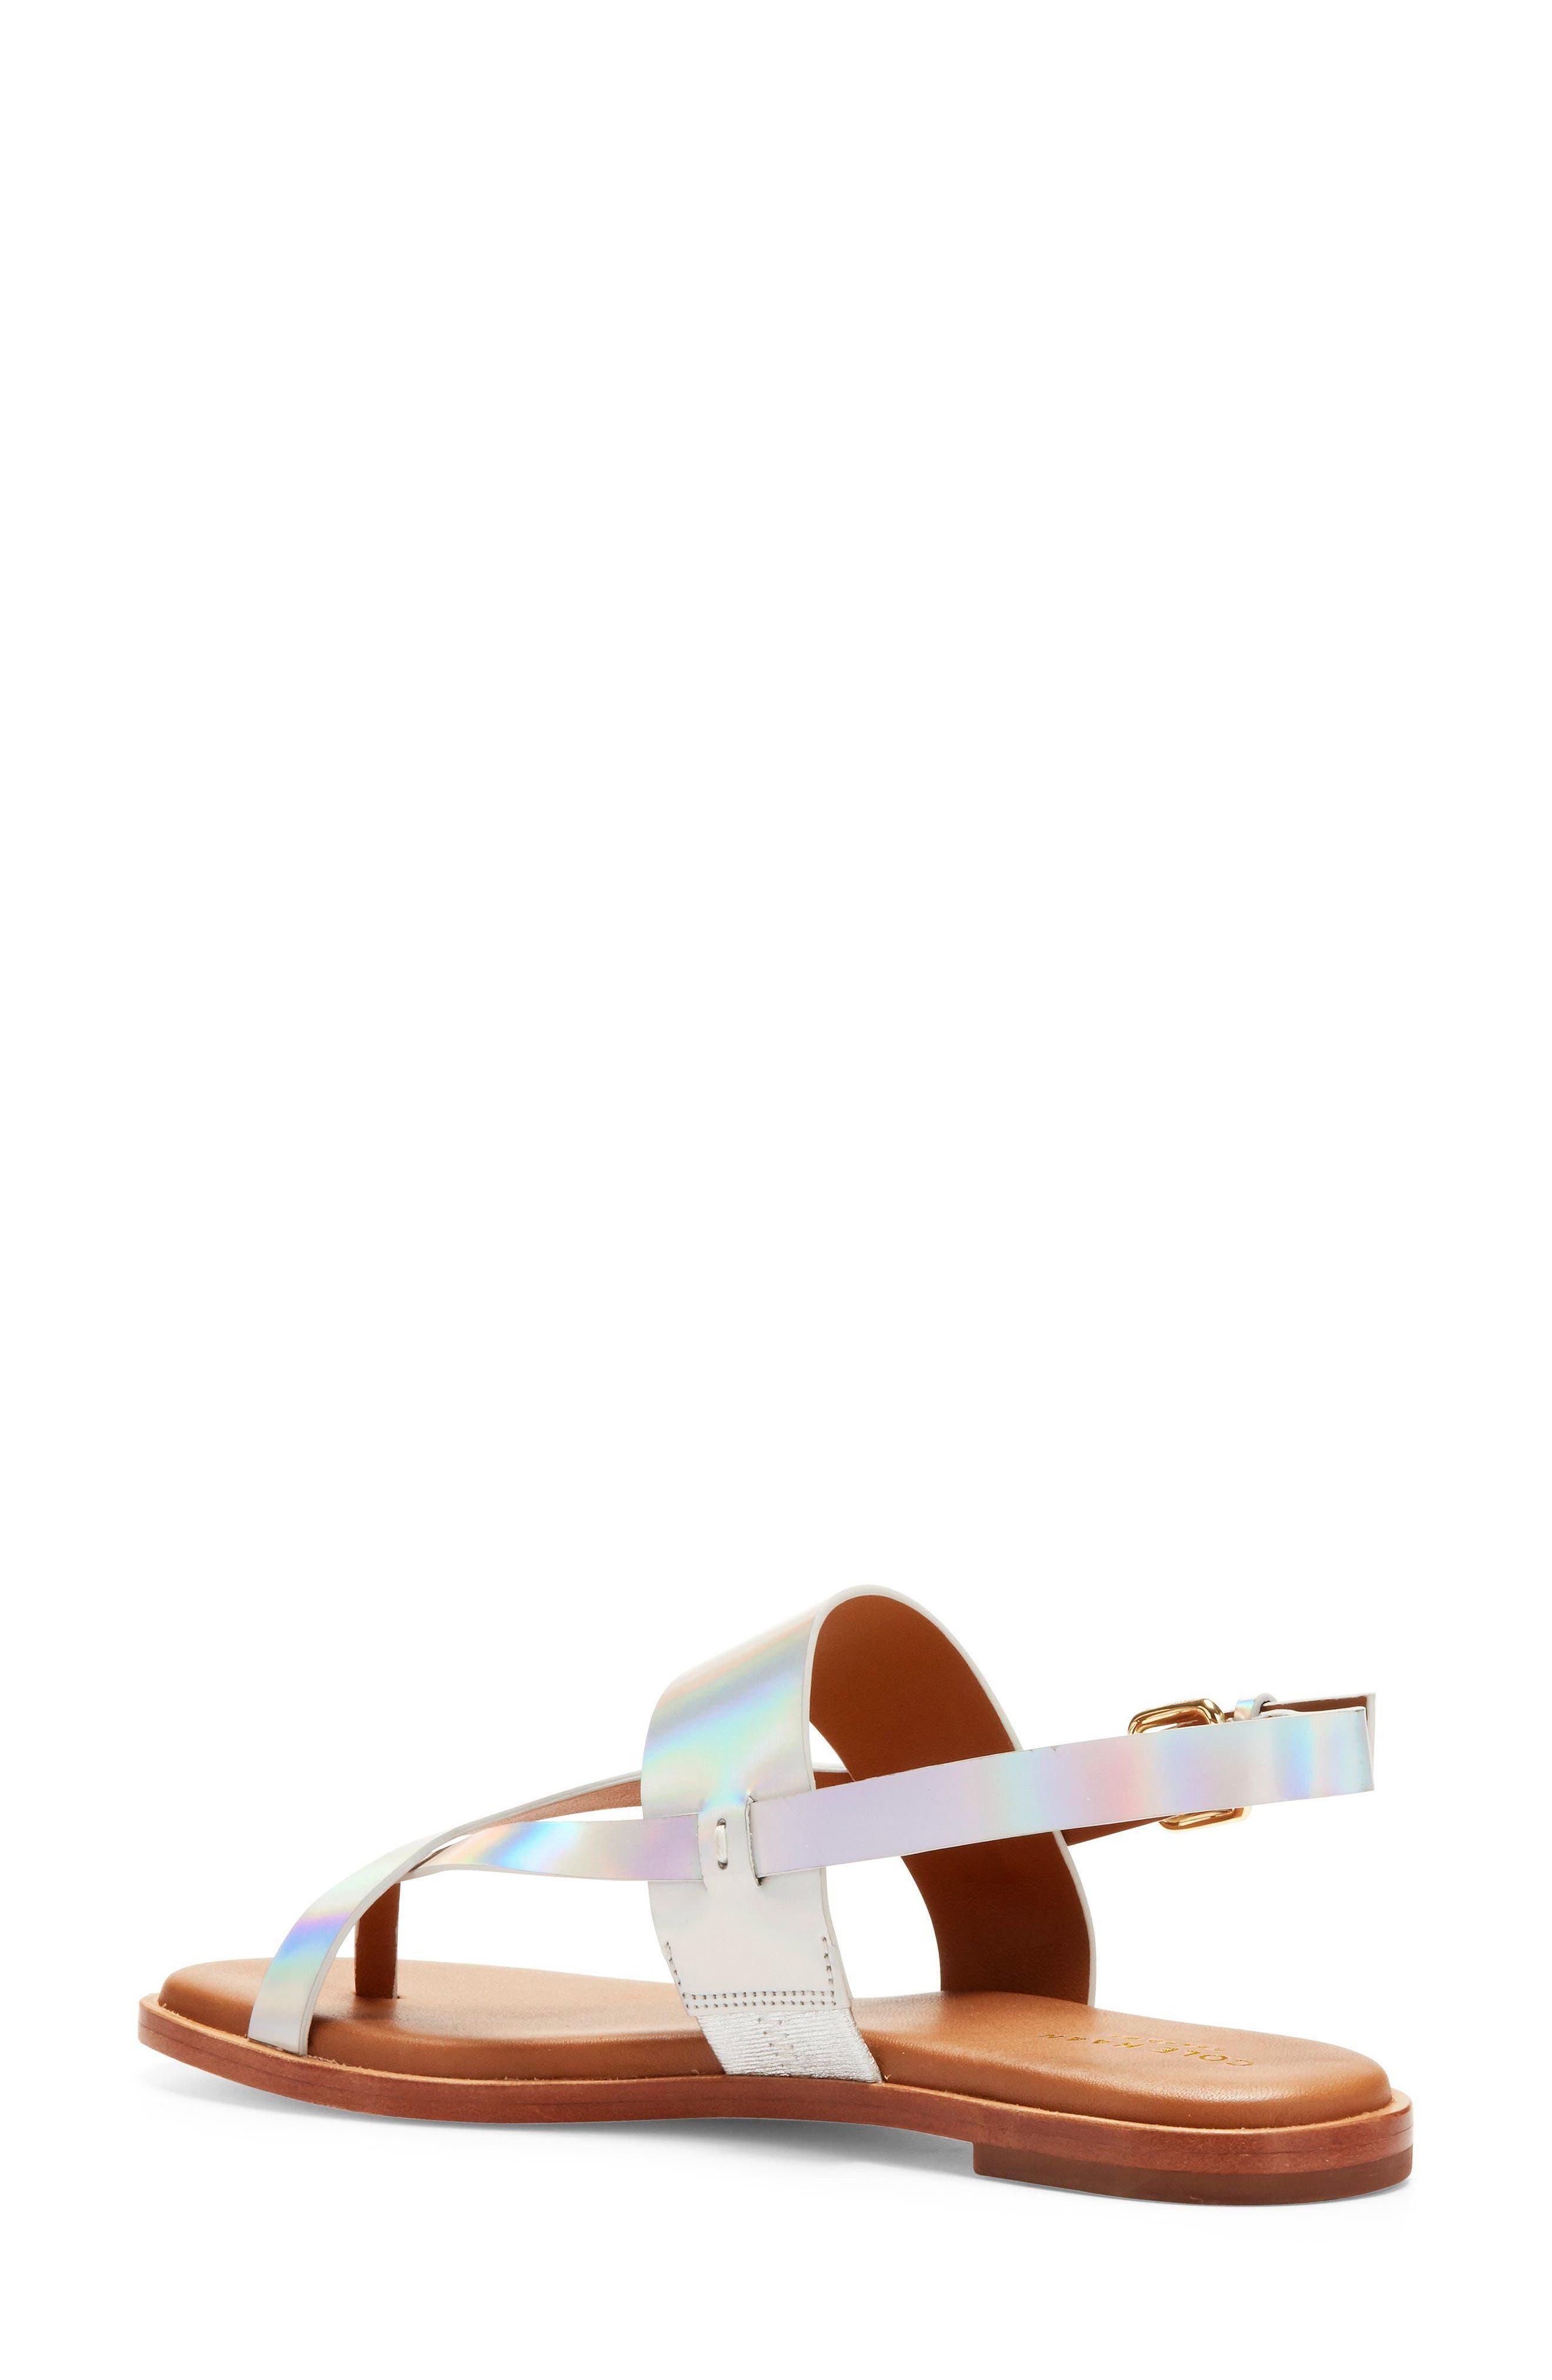 Anica Sandal,                             Alternate thumbnail 2, color,                             Iridescent Leather